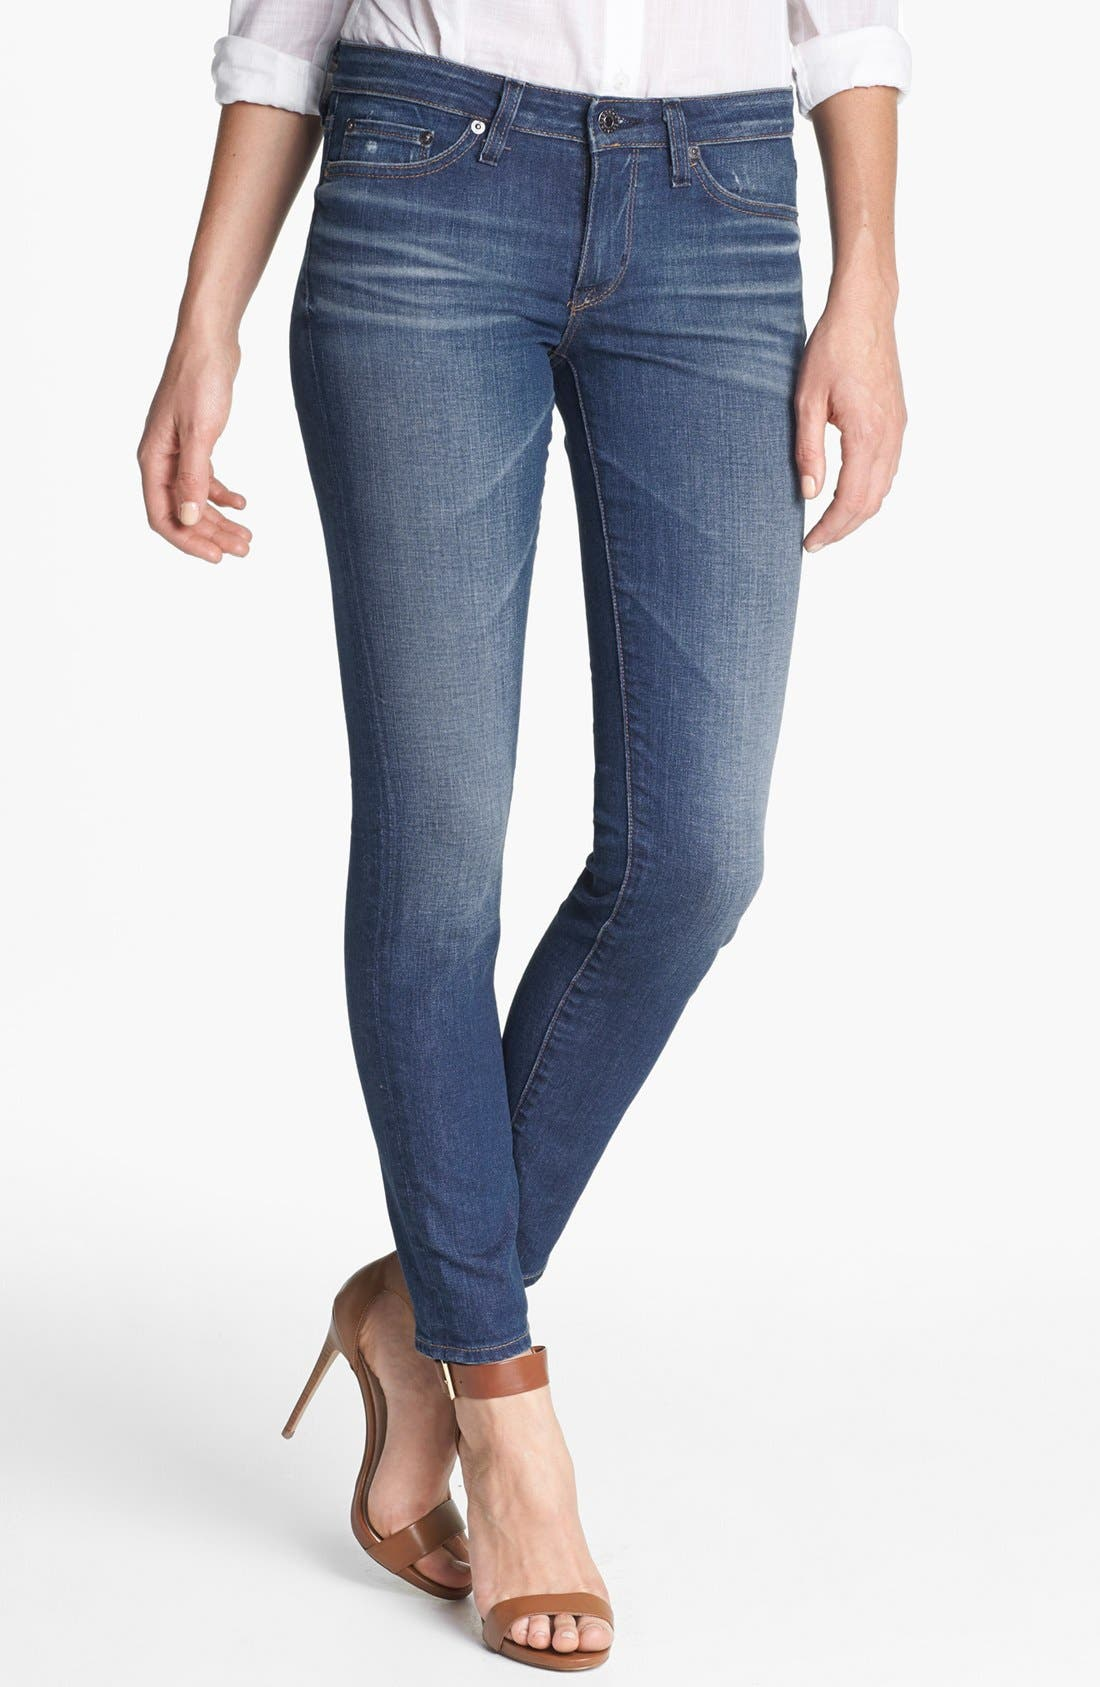 Main Image - Big Star 'Alex' Stretch Skinny Jeans (Six Year Tide) (Petite)